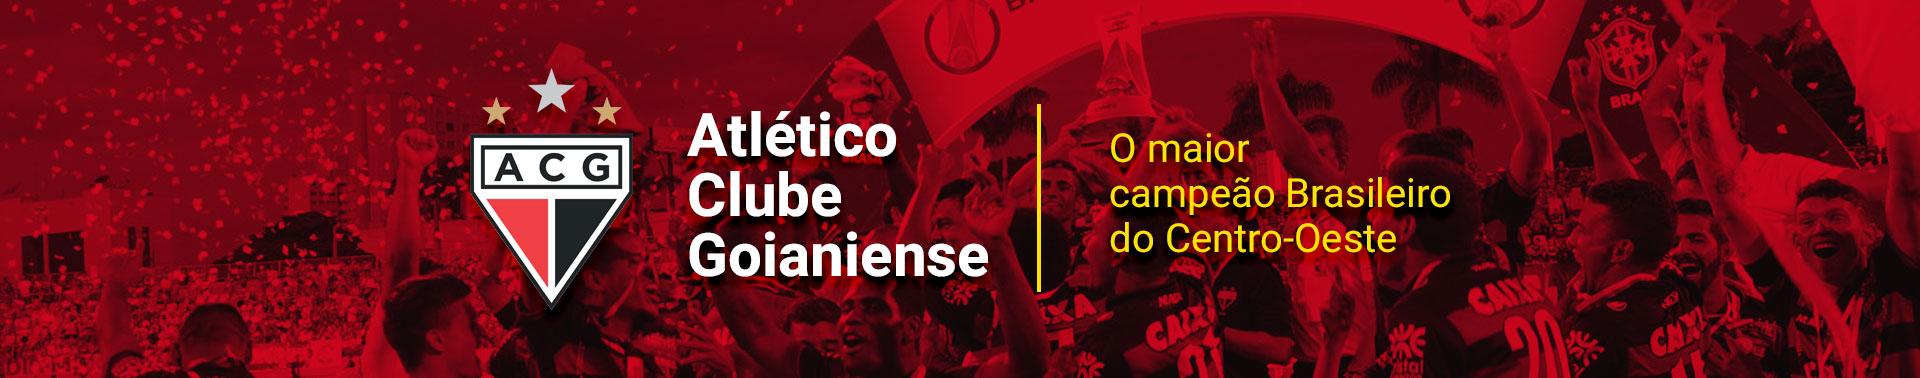 Atlético Goianiense